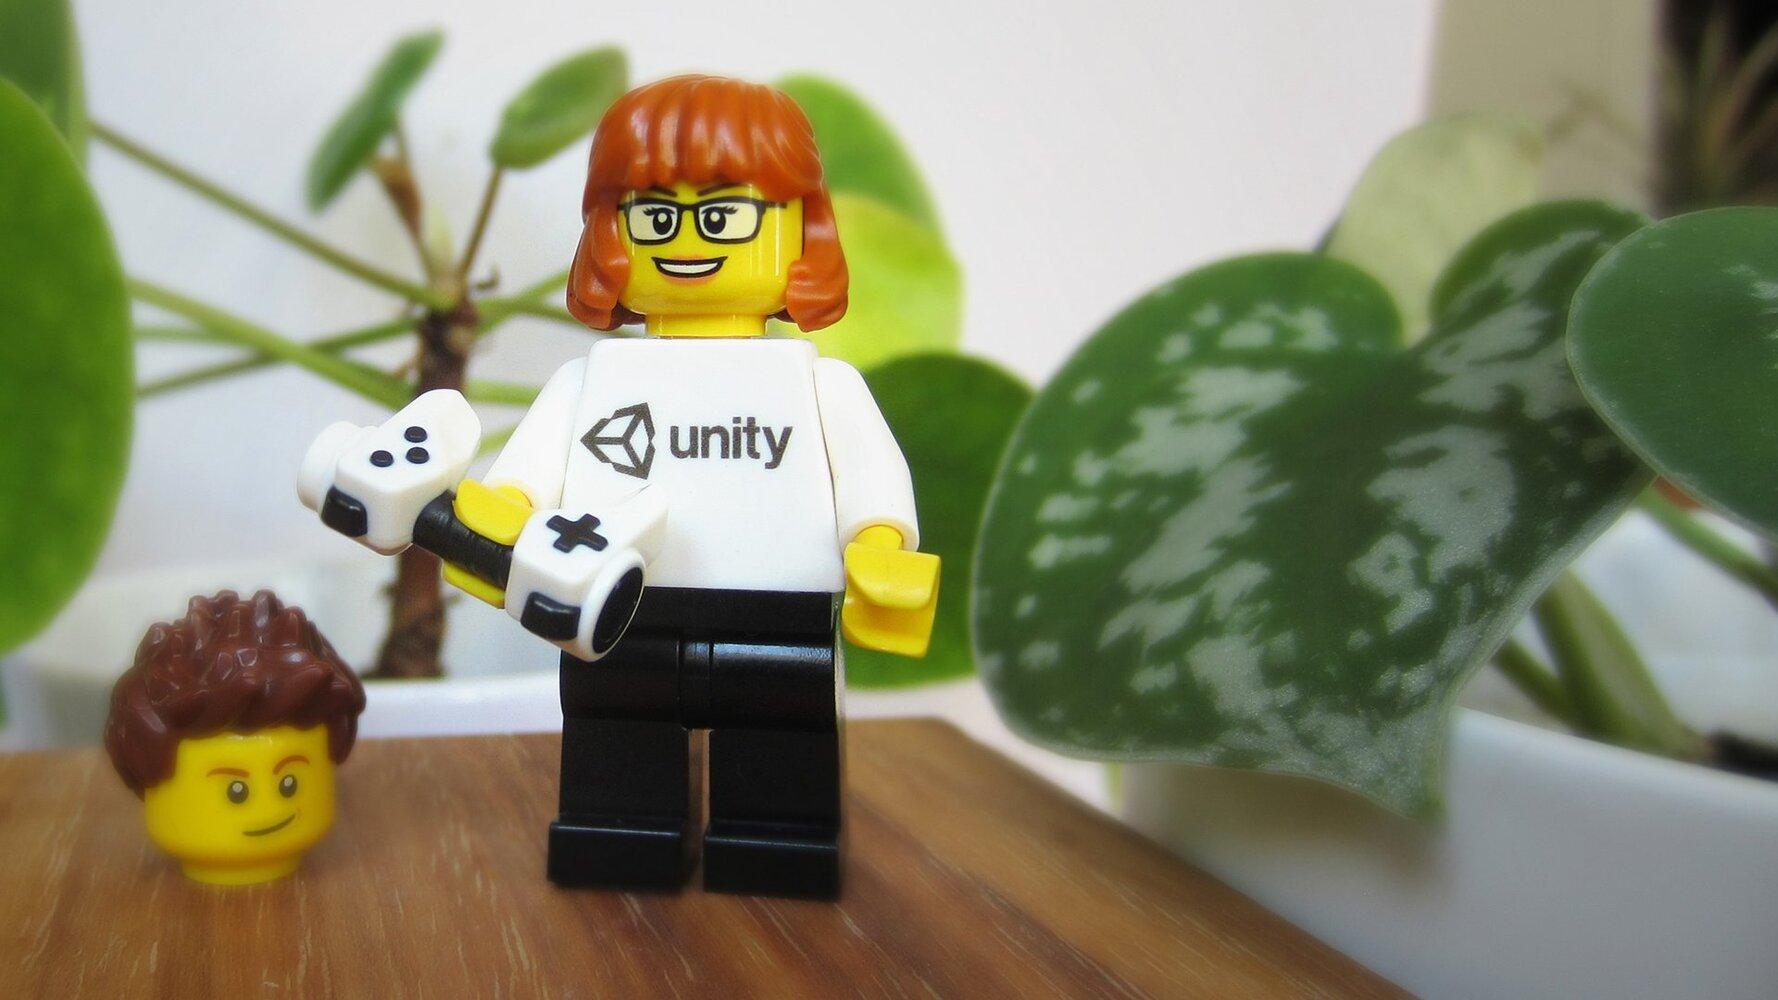 Unity x Lego Minifigure